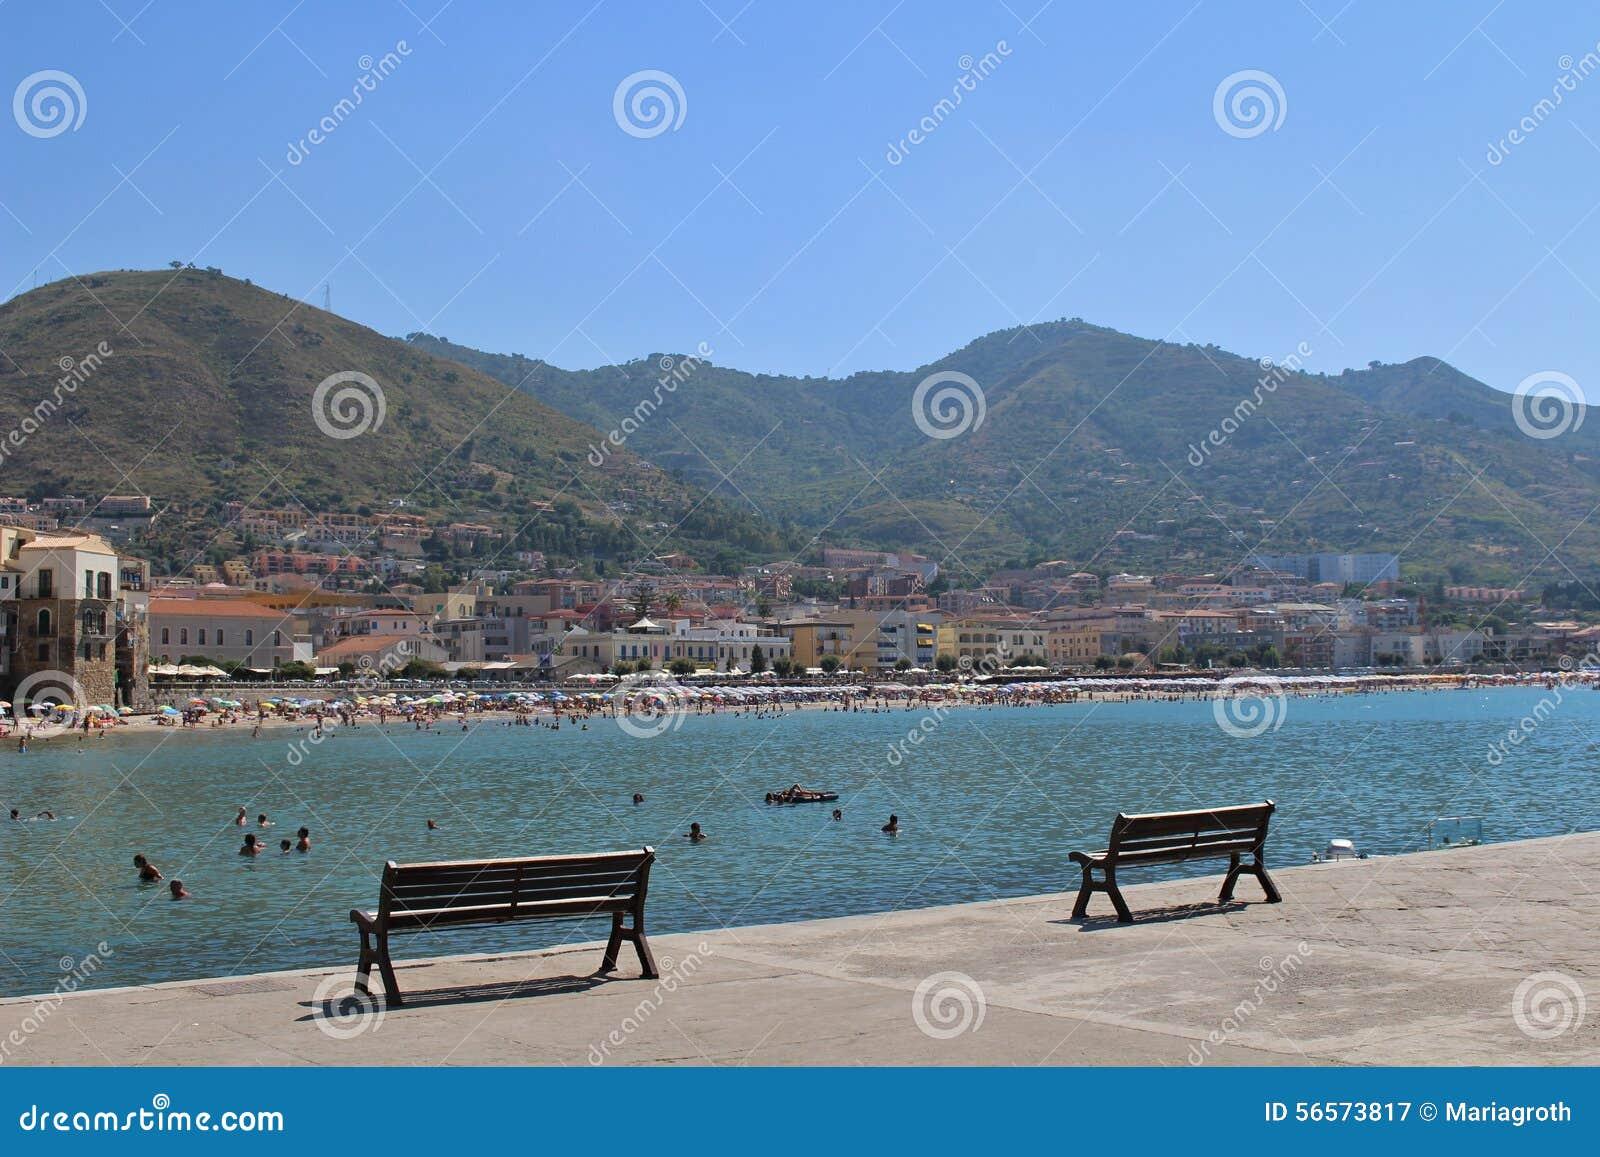 Download Η παραλία σε Cefalà ¹ εκδοτική φωτογραφία. εικόνα από συσσωματωμάτων - 56573817